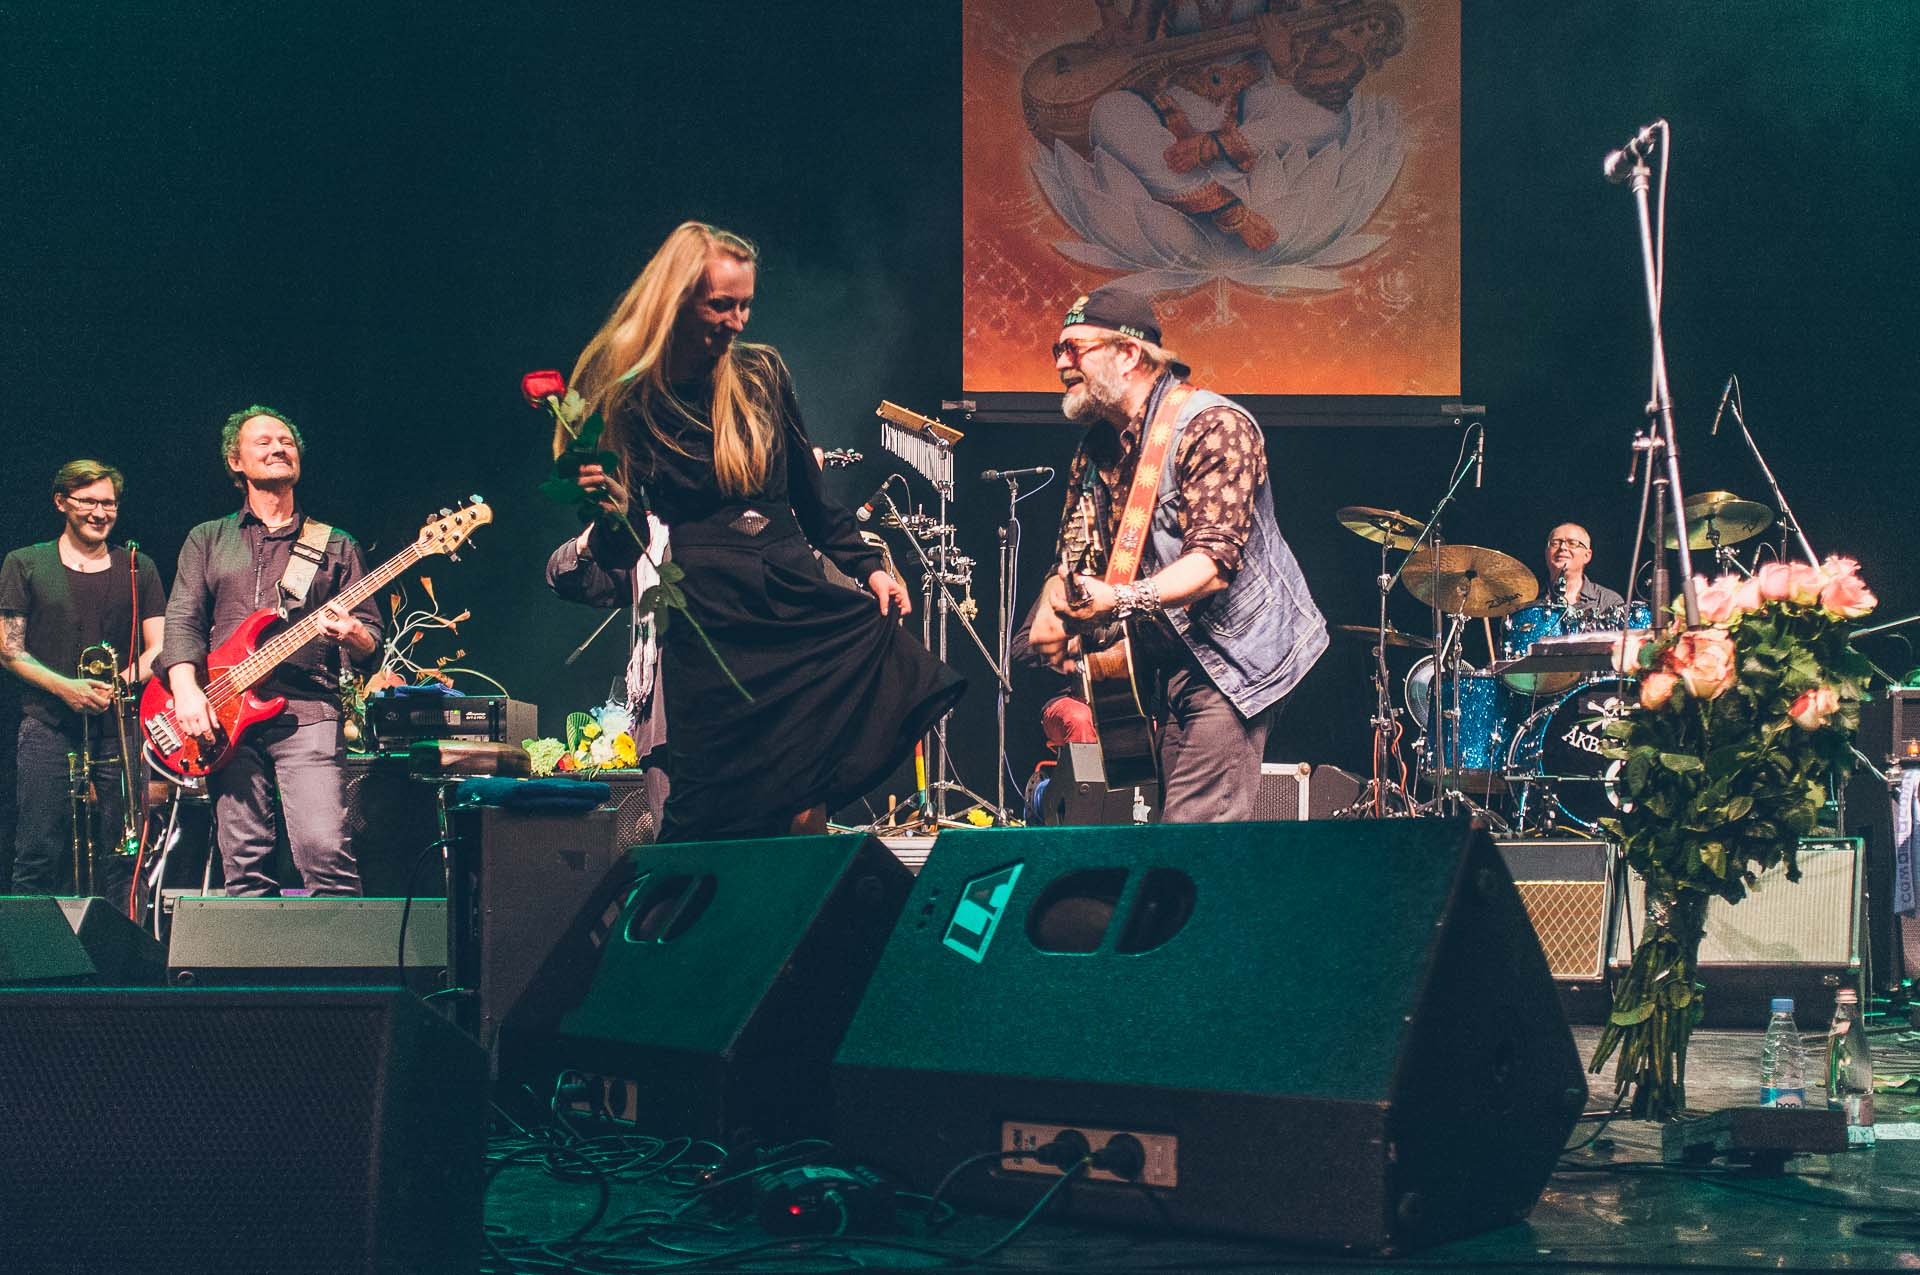 Таня танцует с Борисом Борисовичем под «Стаканы»